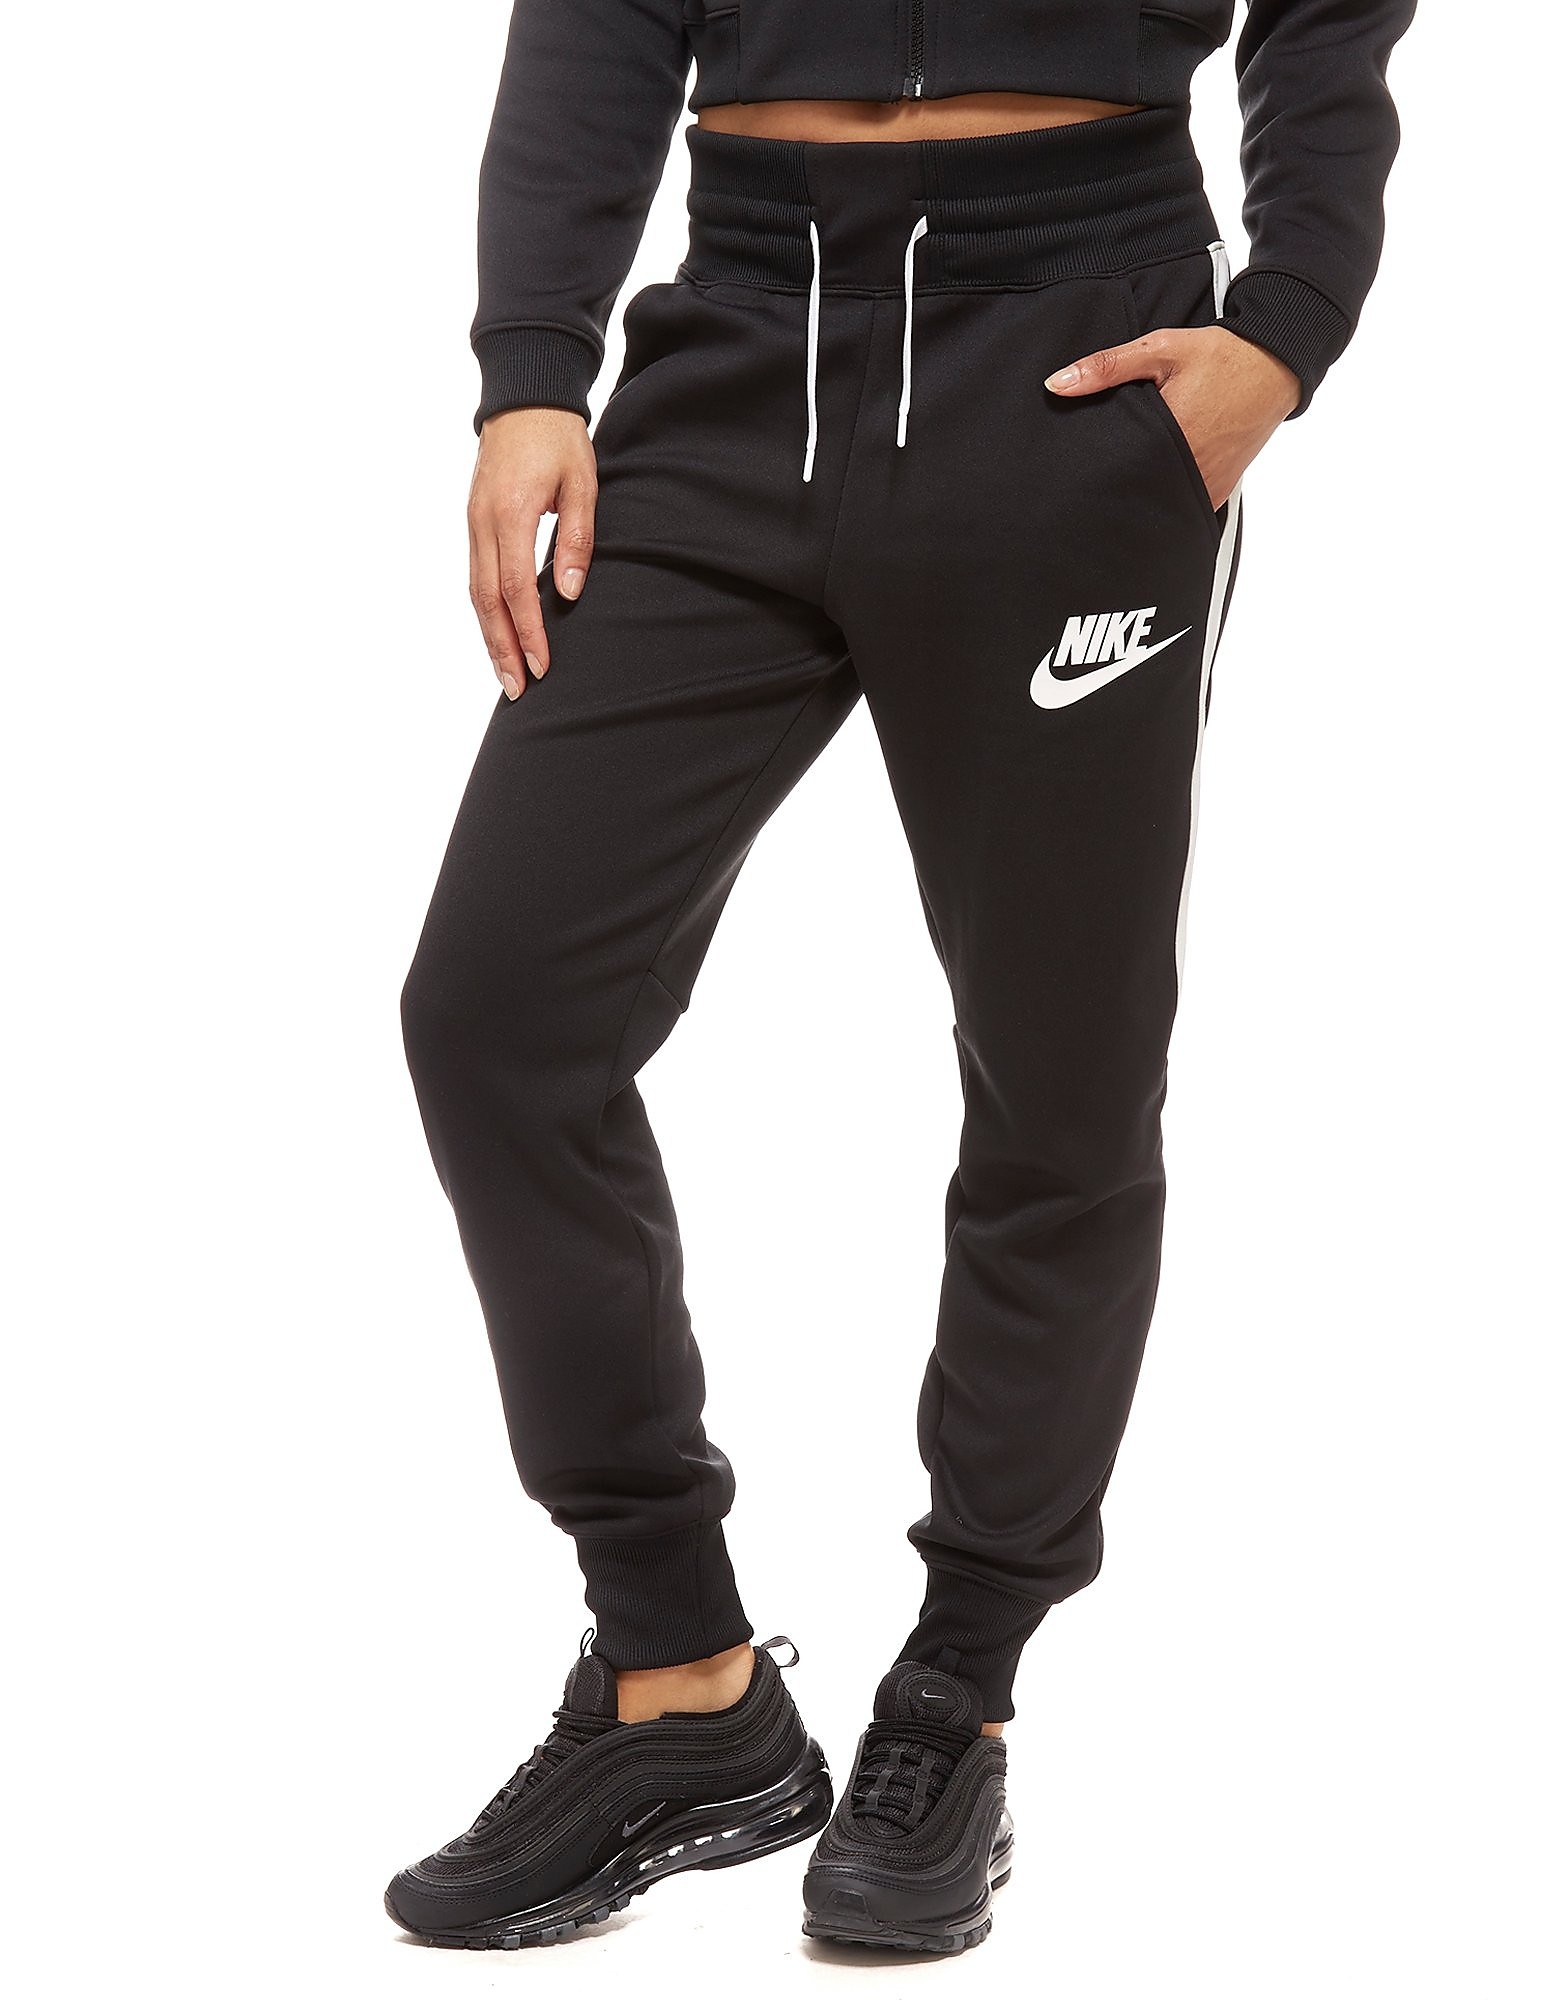 Nike pantalón de chándal N98